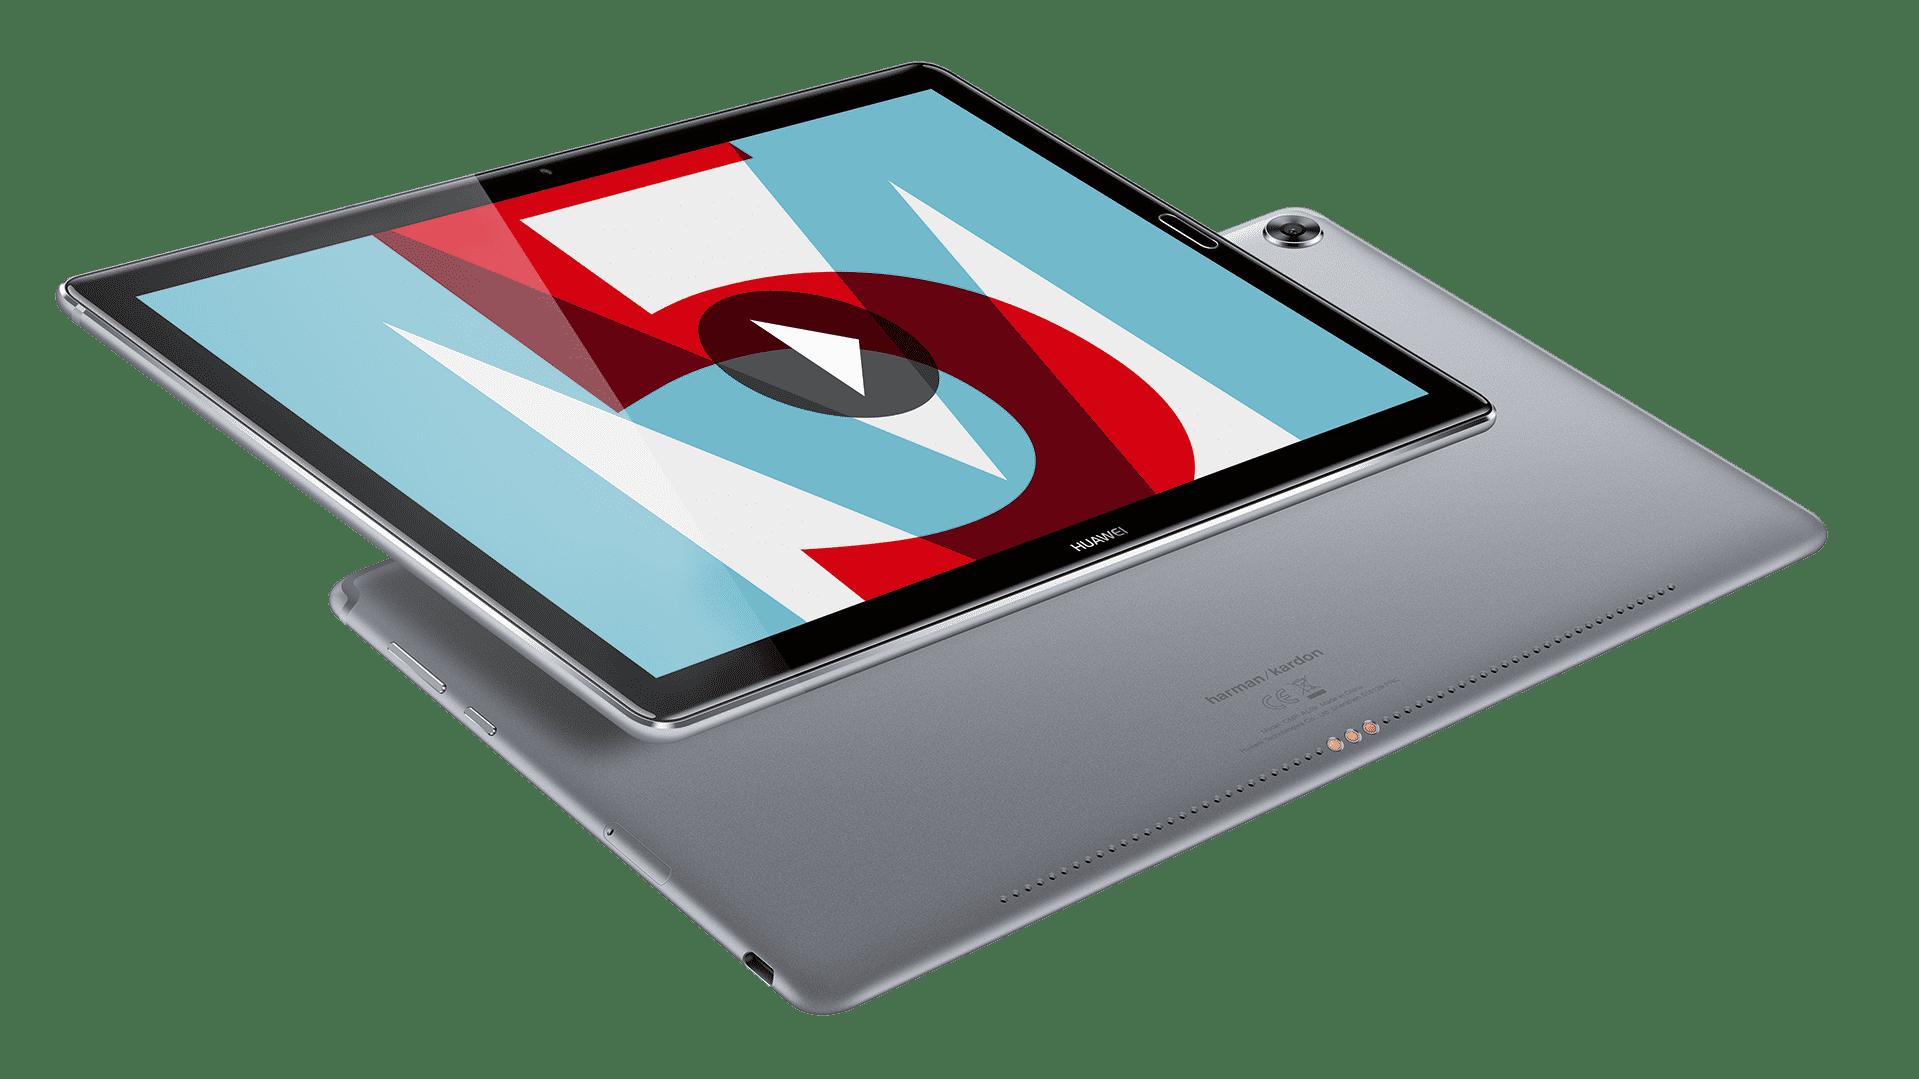 Huawei bringt iPad-Pro-Konkurrenten mit Stift